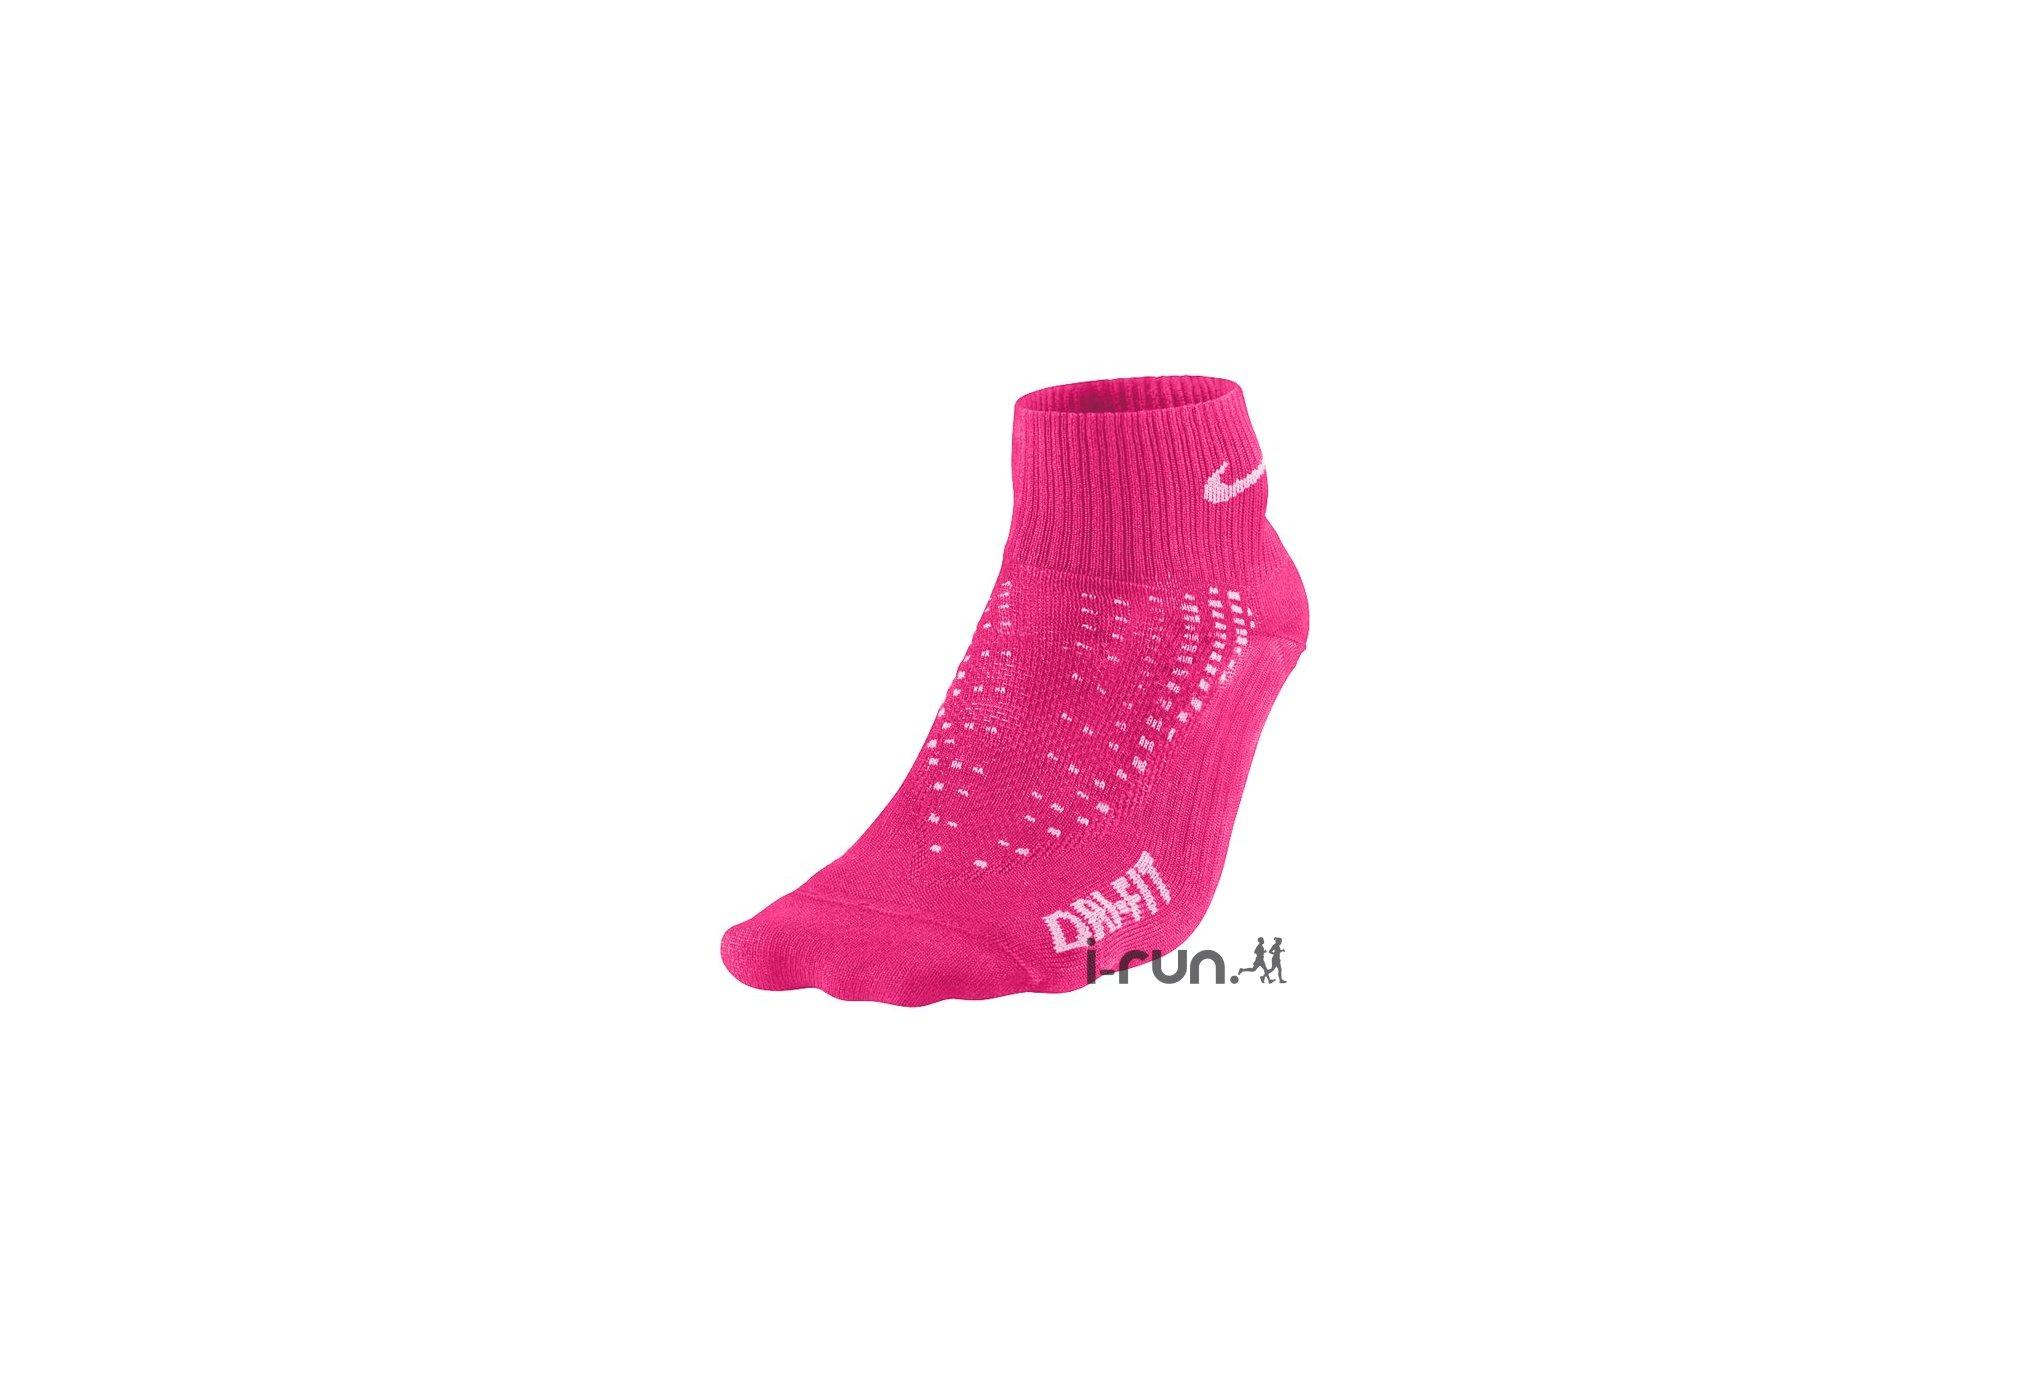 Nike chaussettes anti blister lightweight quarter pas cher destockage nike - Destockage fitness avis ...